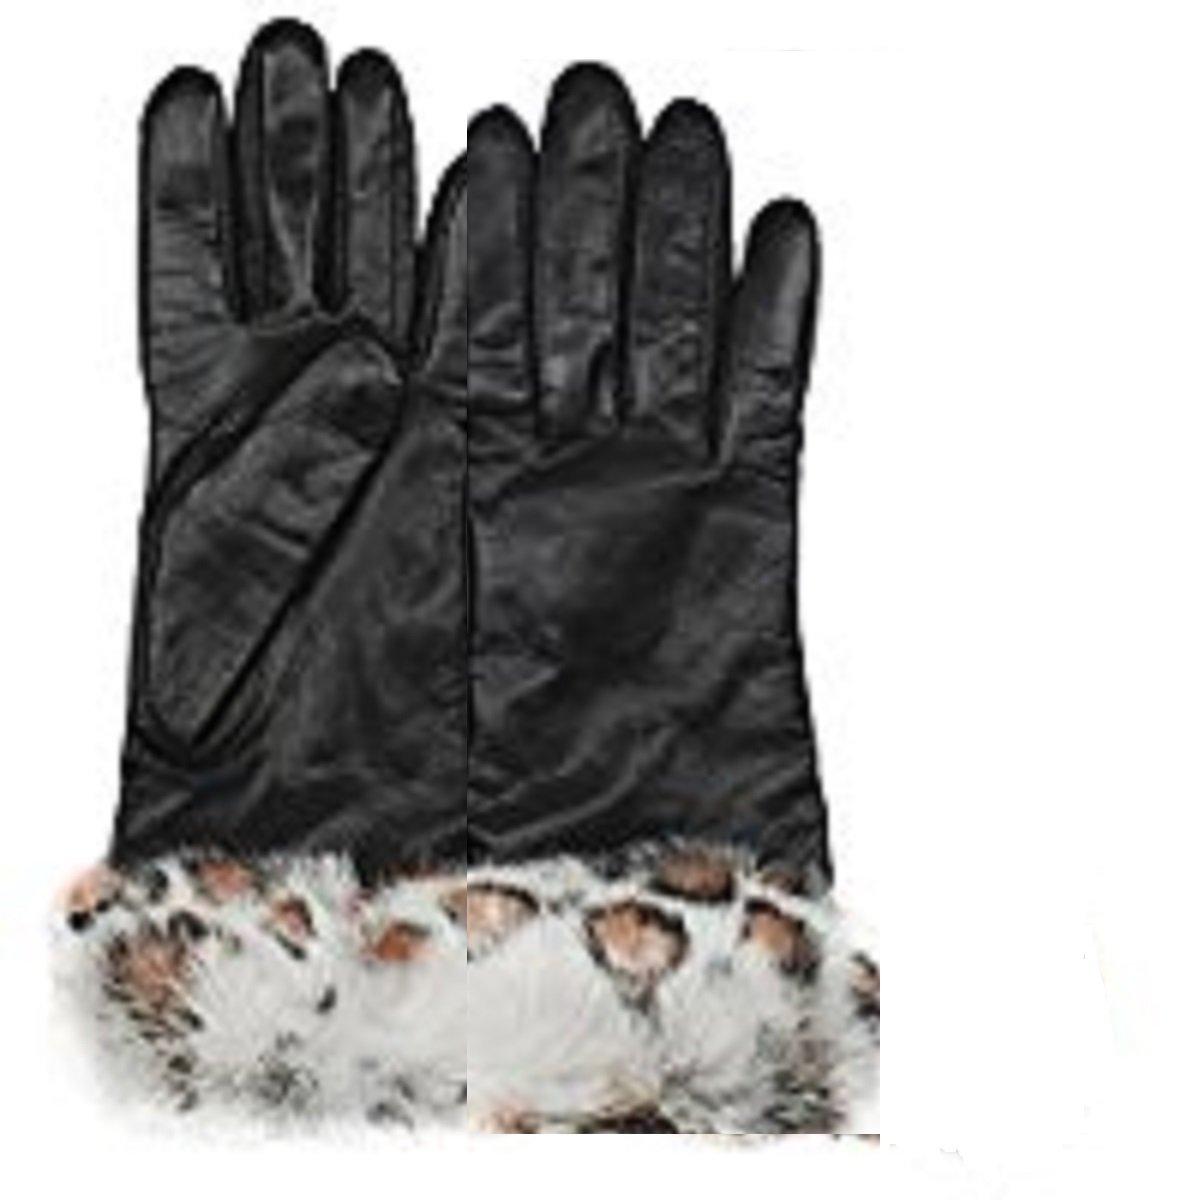 Grandoe Women's NAPLES Sheepskin Butter Soft Leather Gloves Real Rabbit Fur Cuff, Color: Black/Sno Leopard, Size L